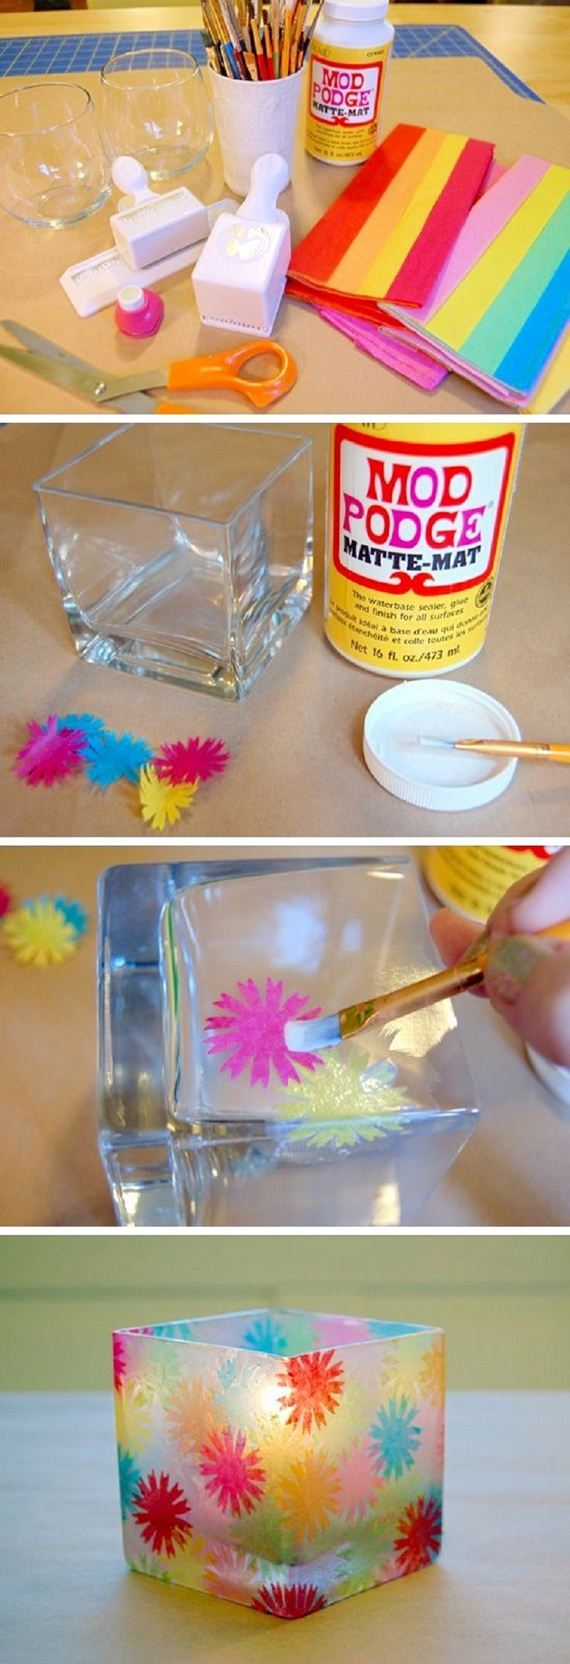 08-Fun-Craft-Ideas